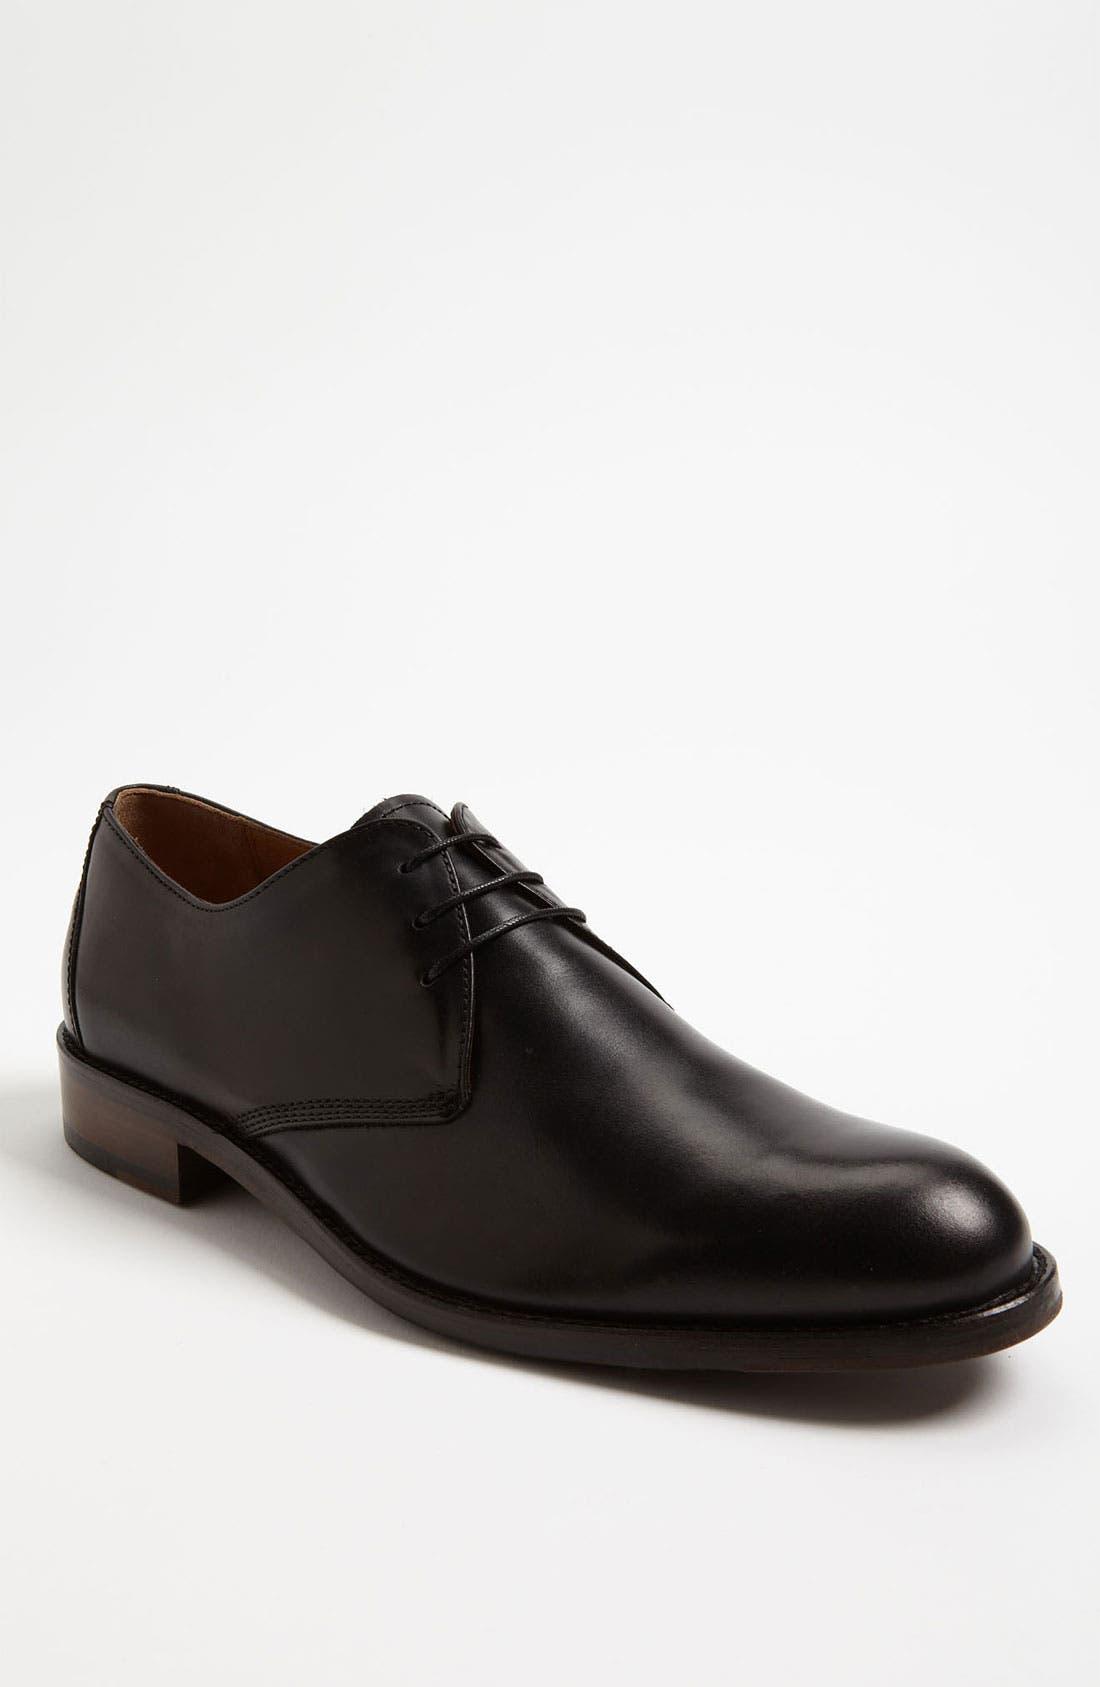 Main Image - Johnston & Murphy 'Hartley' Plain Toe Derby (Men)